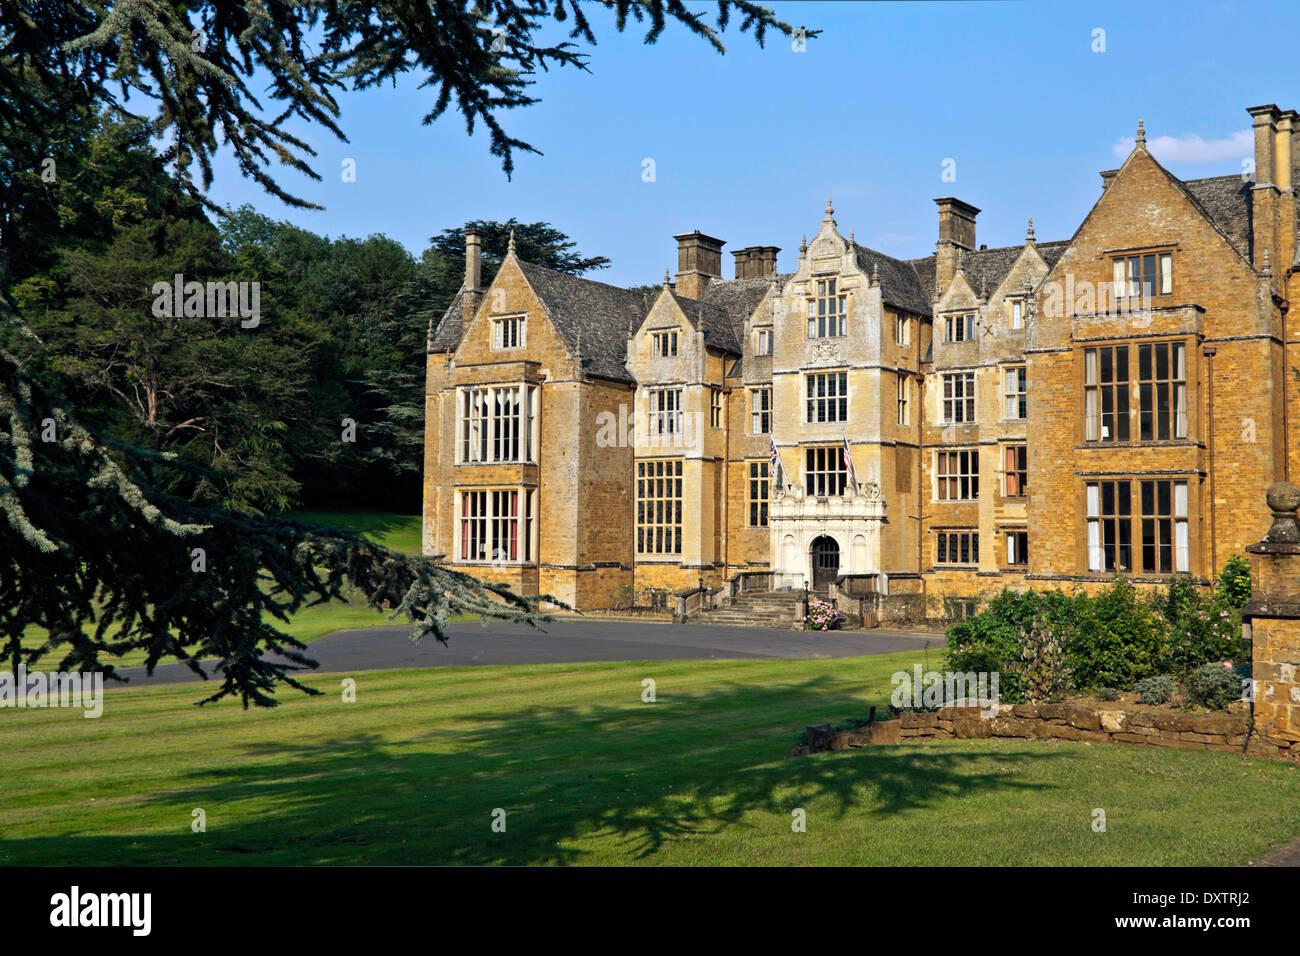 Façade of Wroxton Abbey, a Jacobean house, Wroxton, Oxfordshire, England, Great Britain. - Stock Image